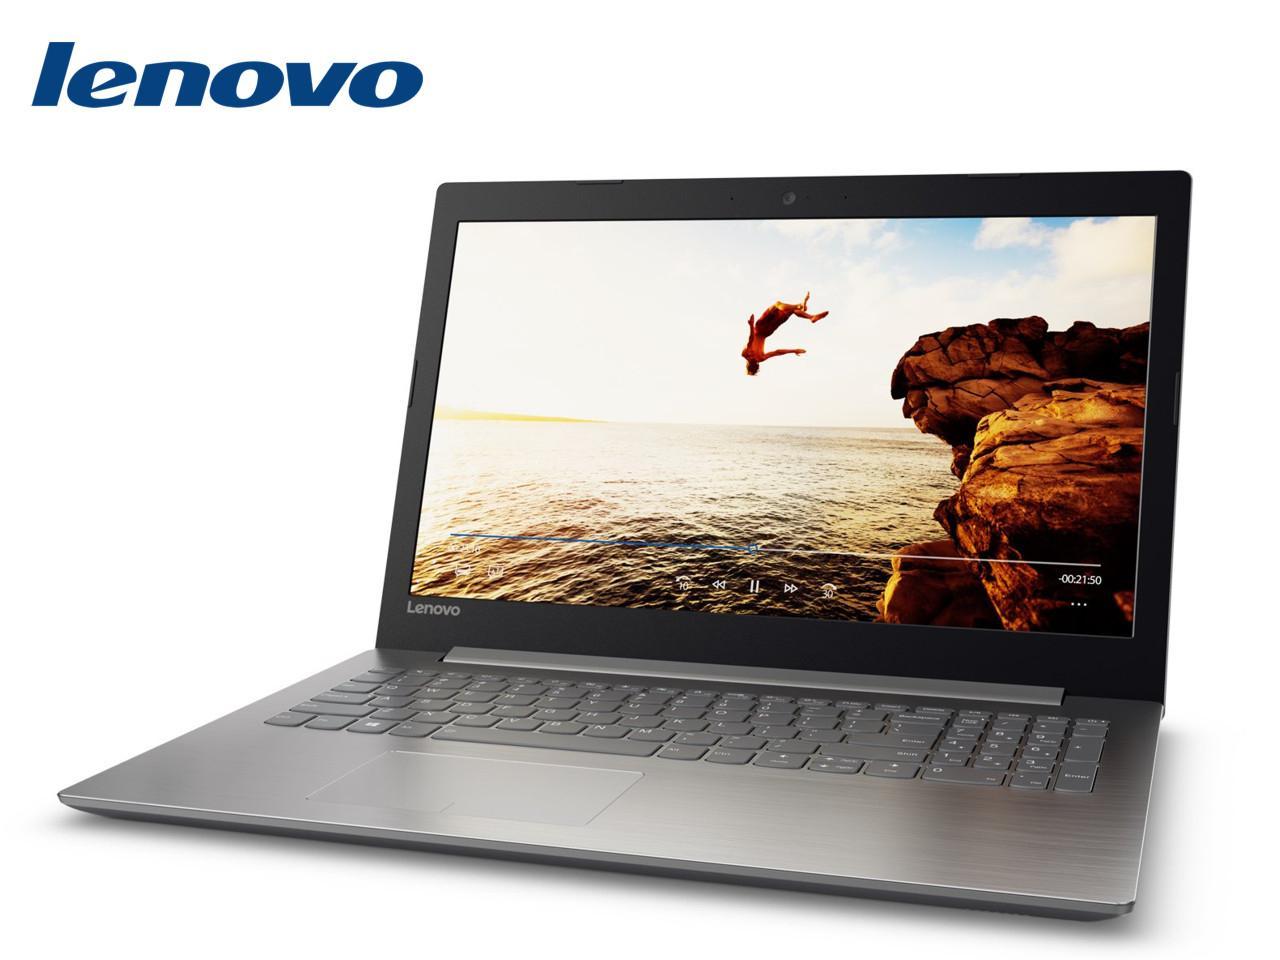 LENOVO IdeaPad 320-15IKB (81BG00P9CK)